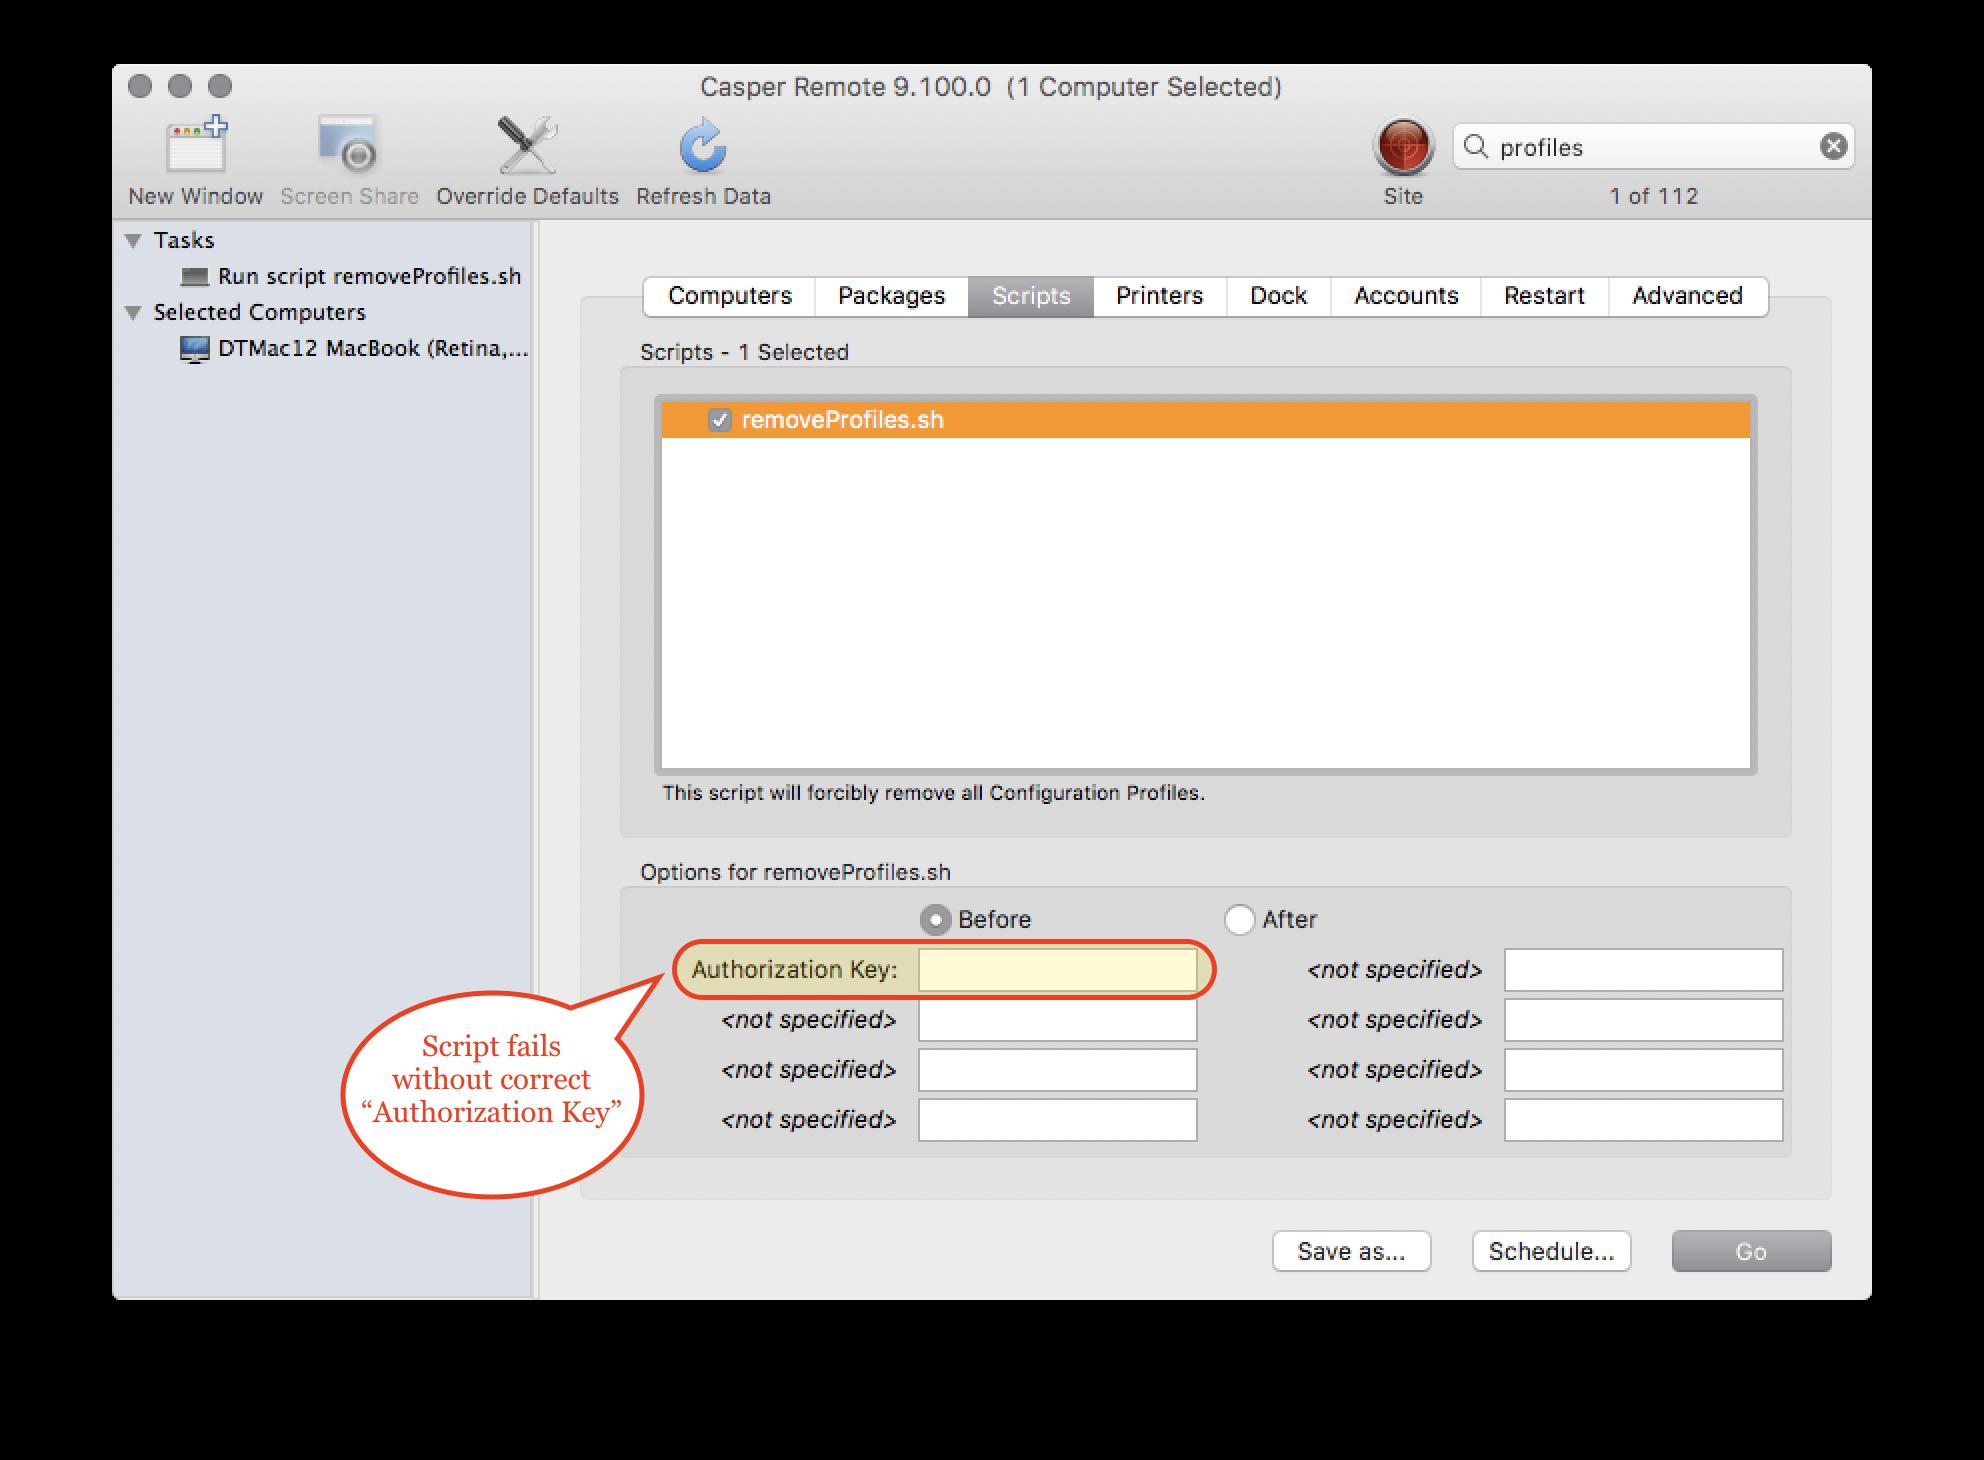 Authorization Key for scripts executed via Casper Remote